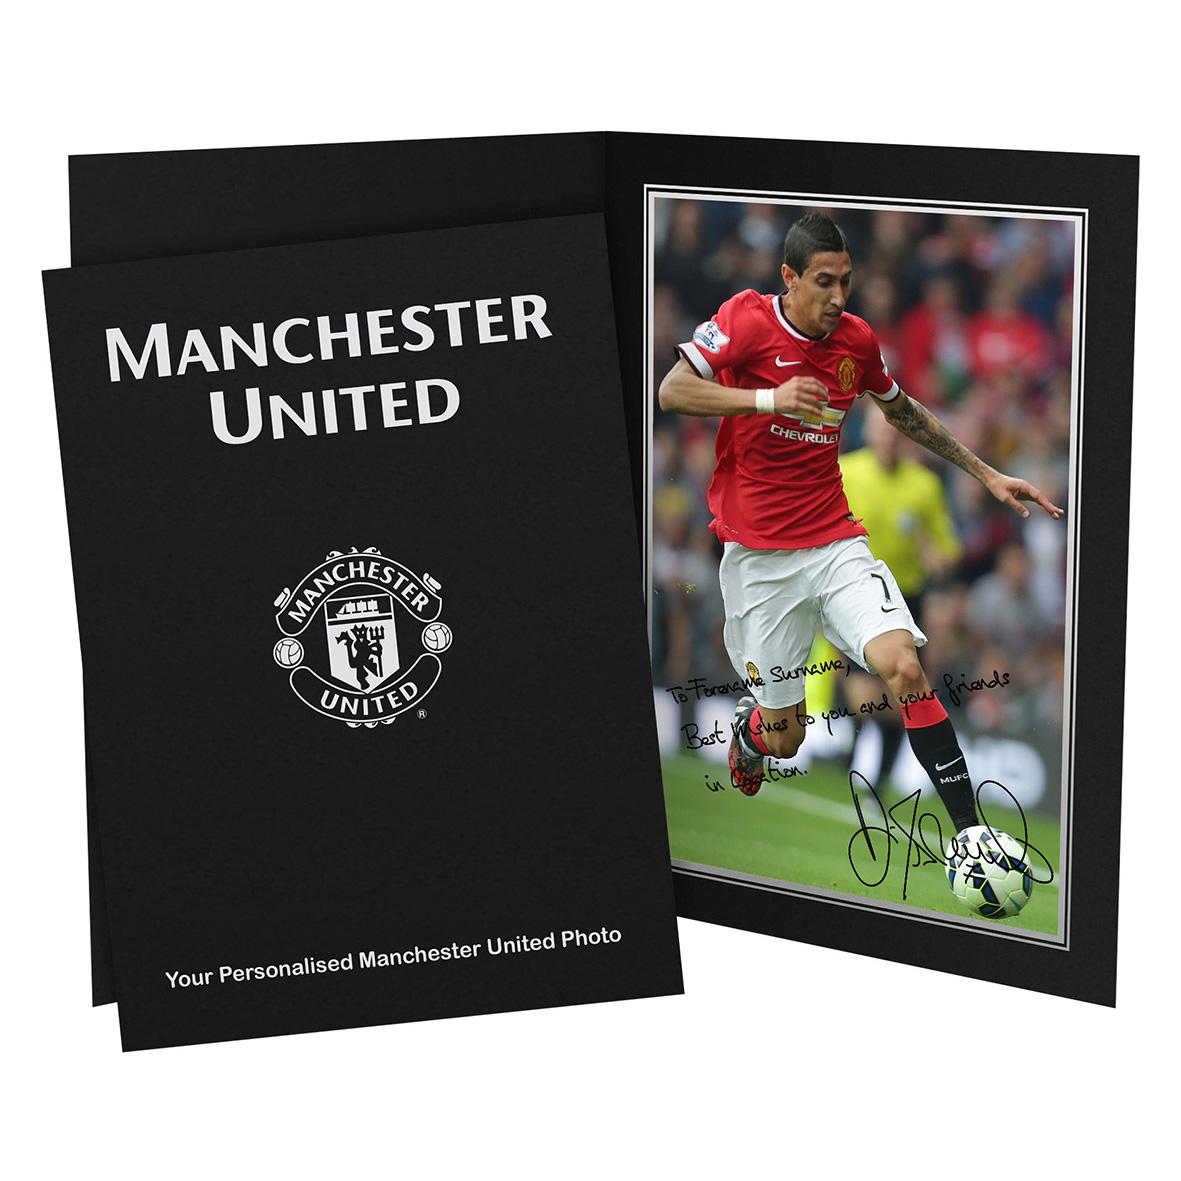 Manchester United Personalised Signature Photo in Presentation Folder - Di Maria